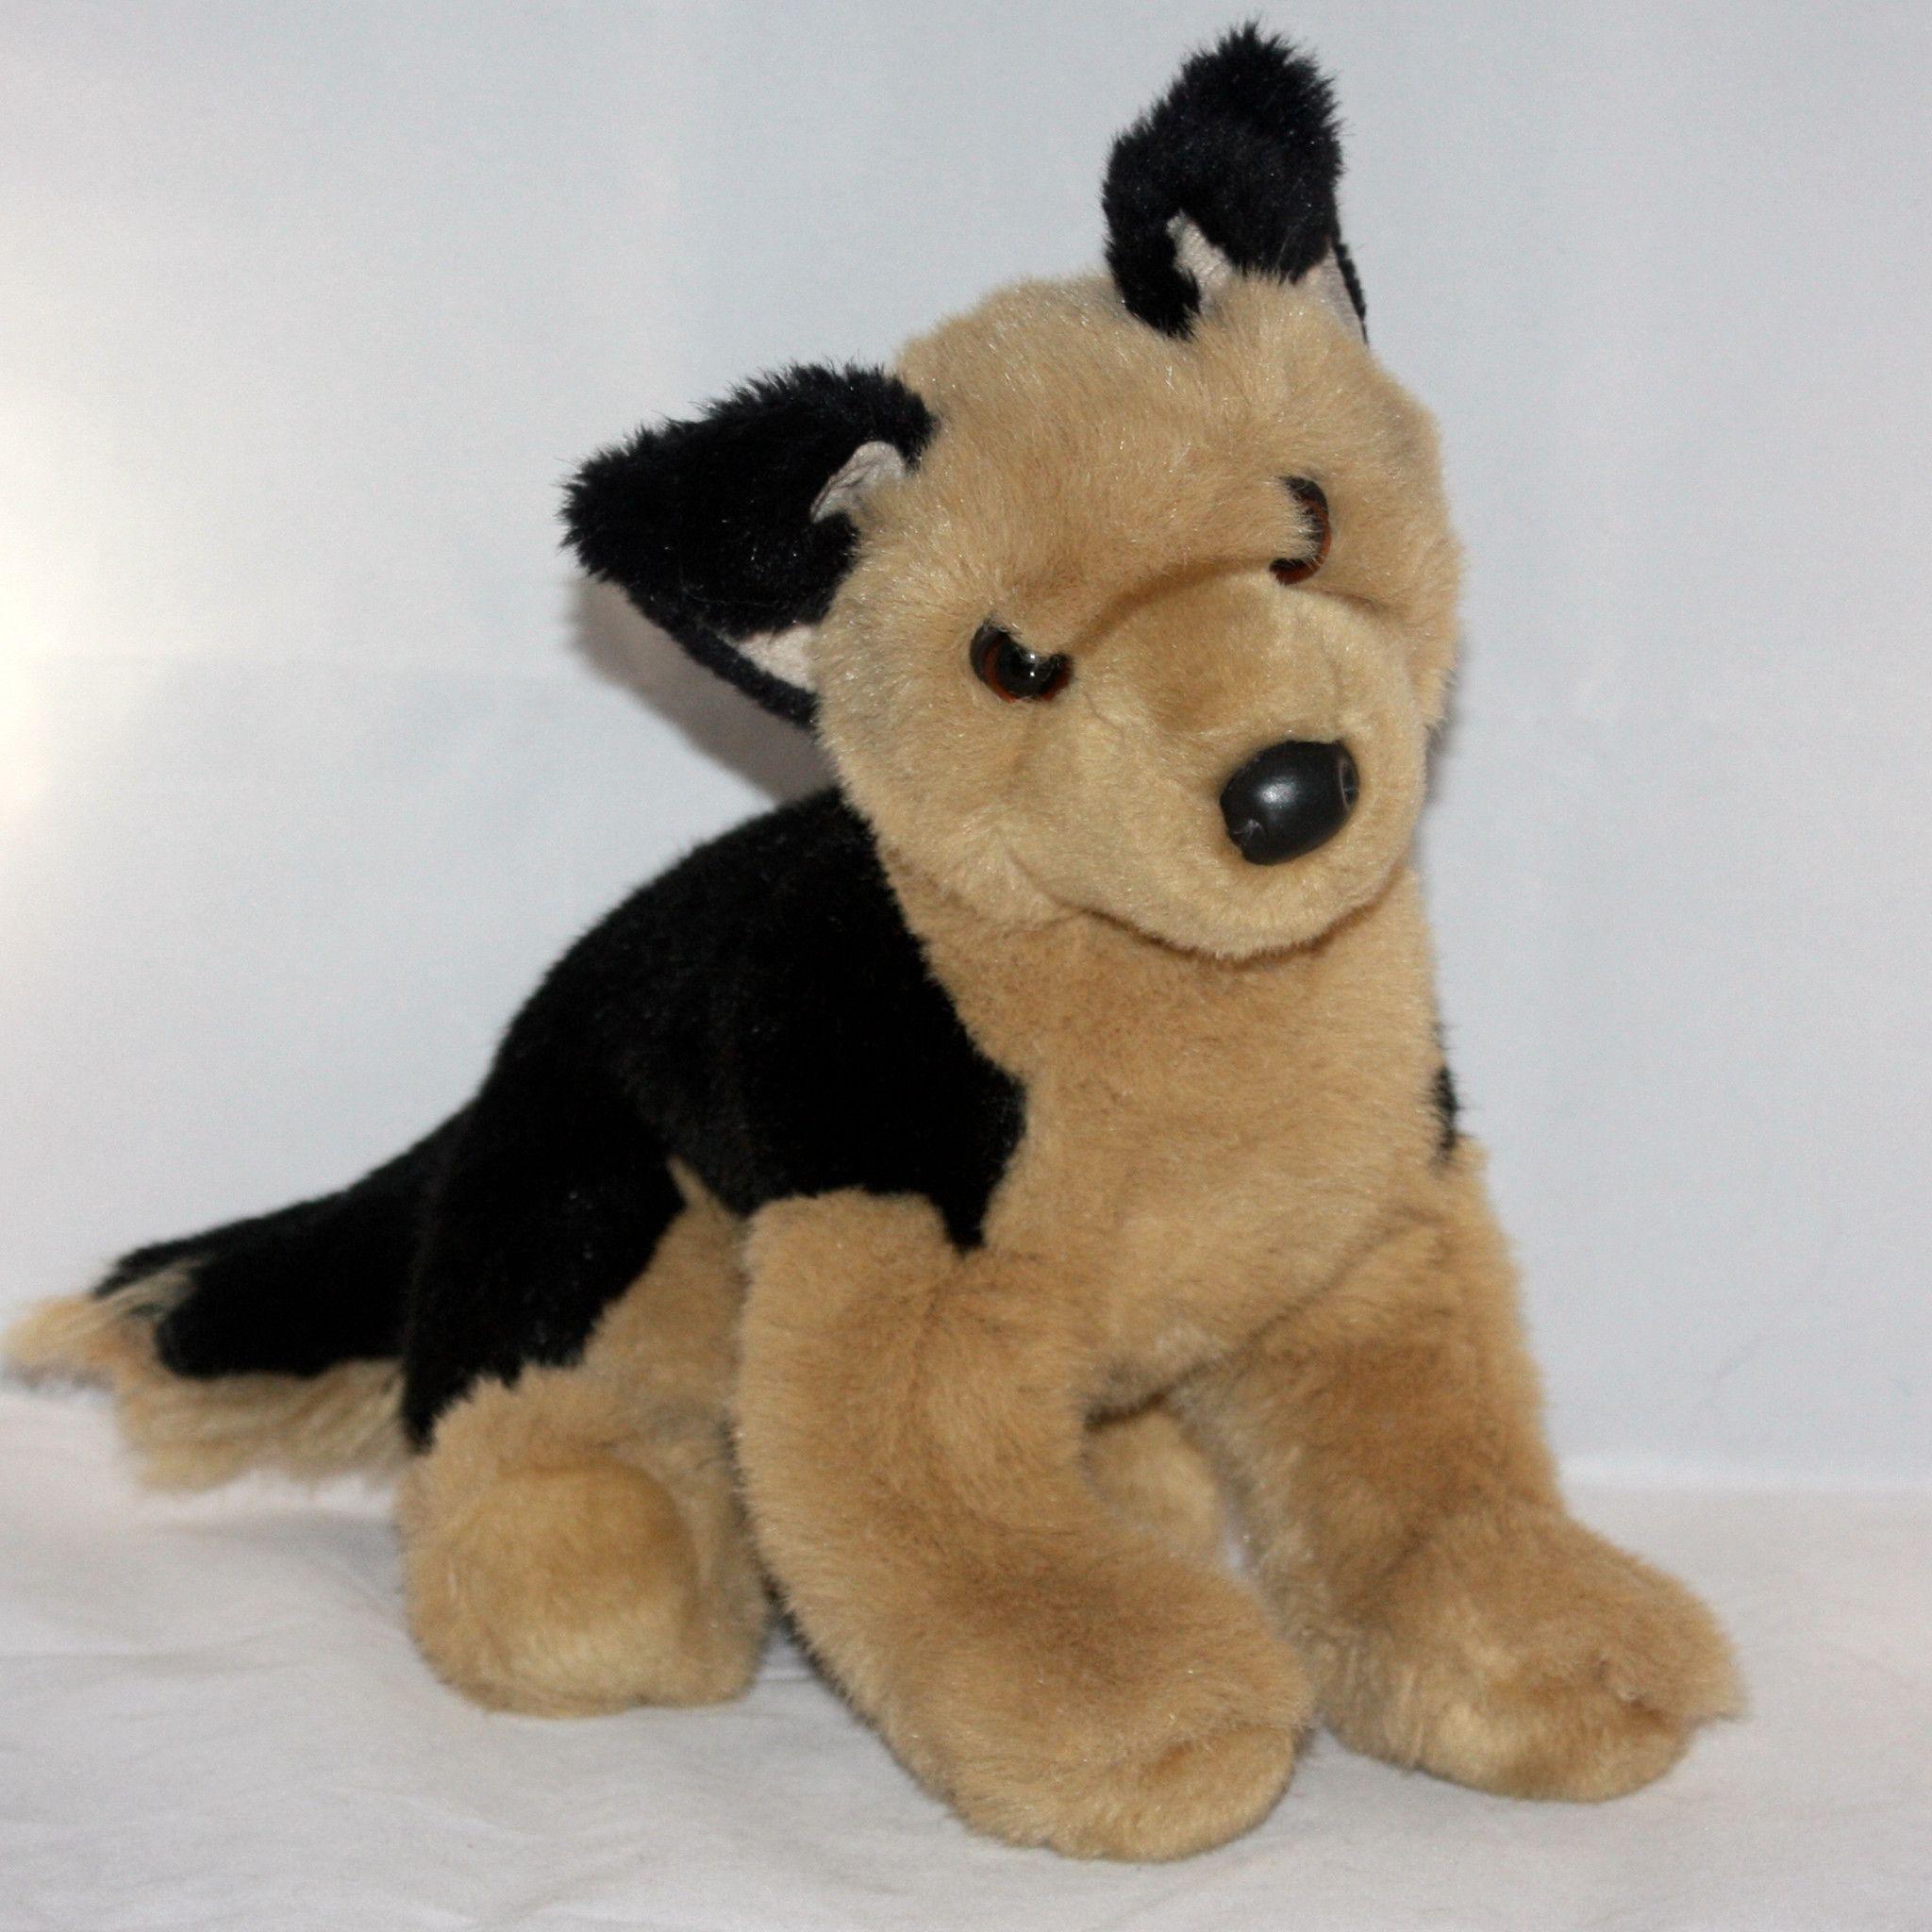 Douglas Cuddle Toy German Shepherd Puppy Dog Stuffed Plush